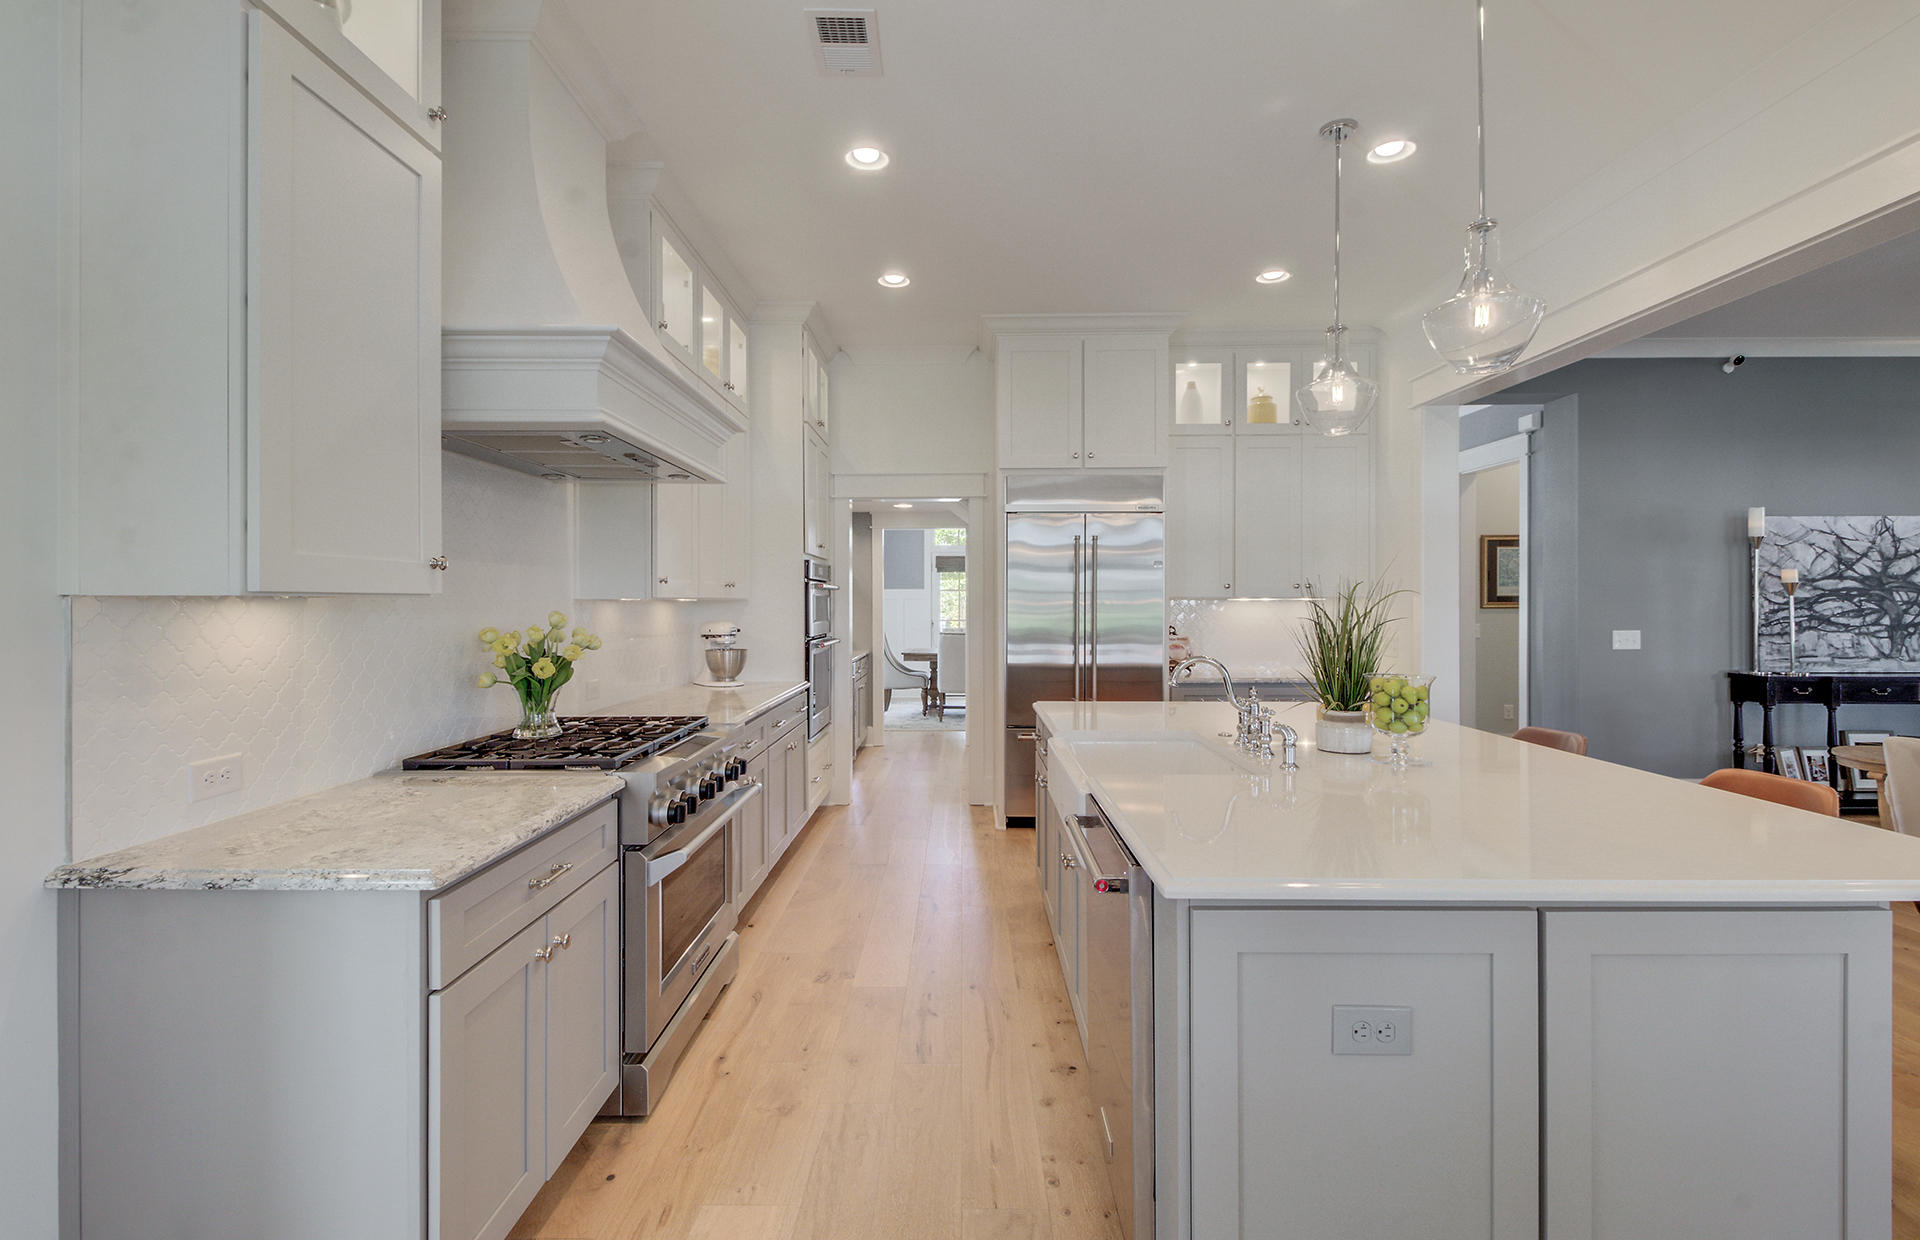 Daniel Island Homes For Sale - 135 Brailsford, Charleston, SC - 35